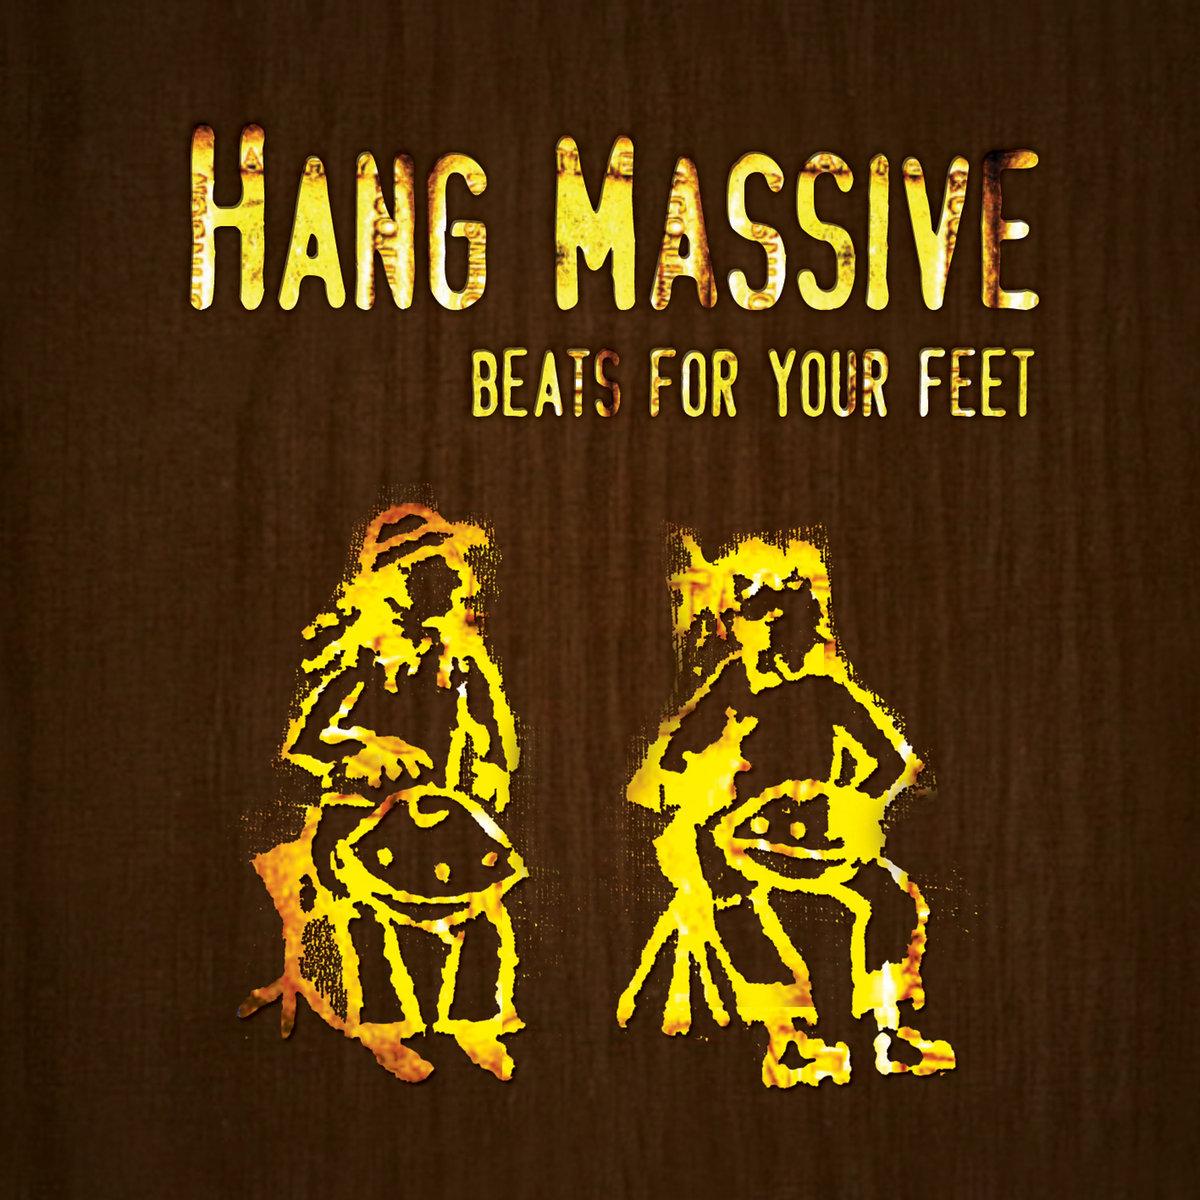 Hang massive beats for your feet торрент